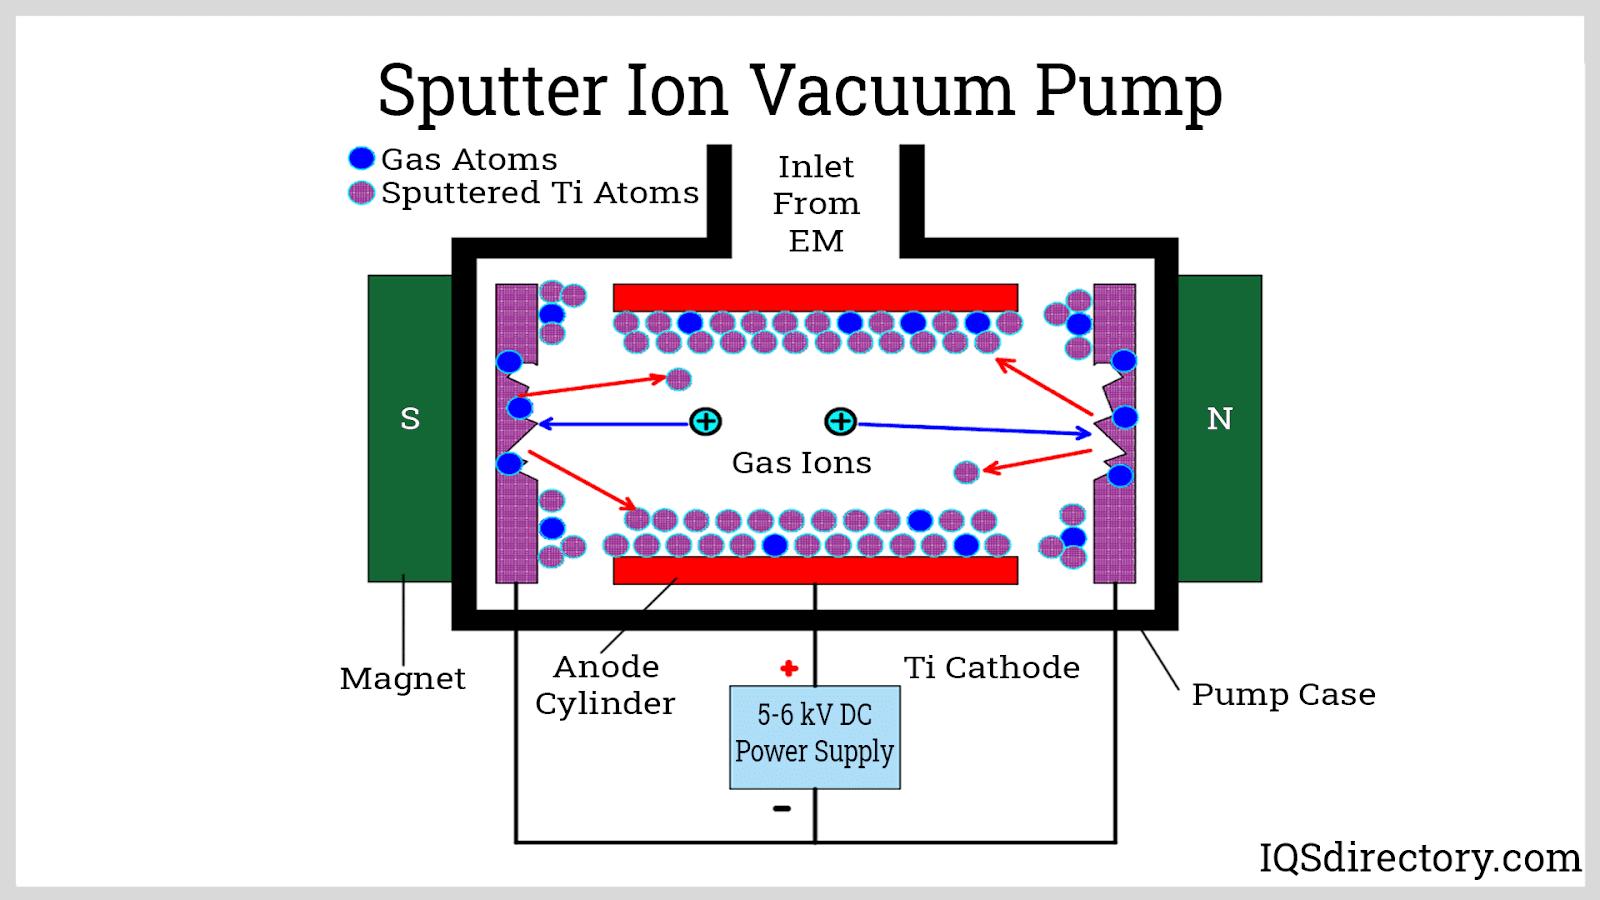 Sputter Ion Vacuum Pump